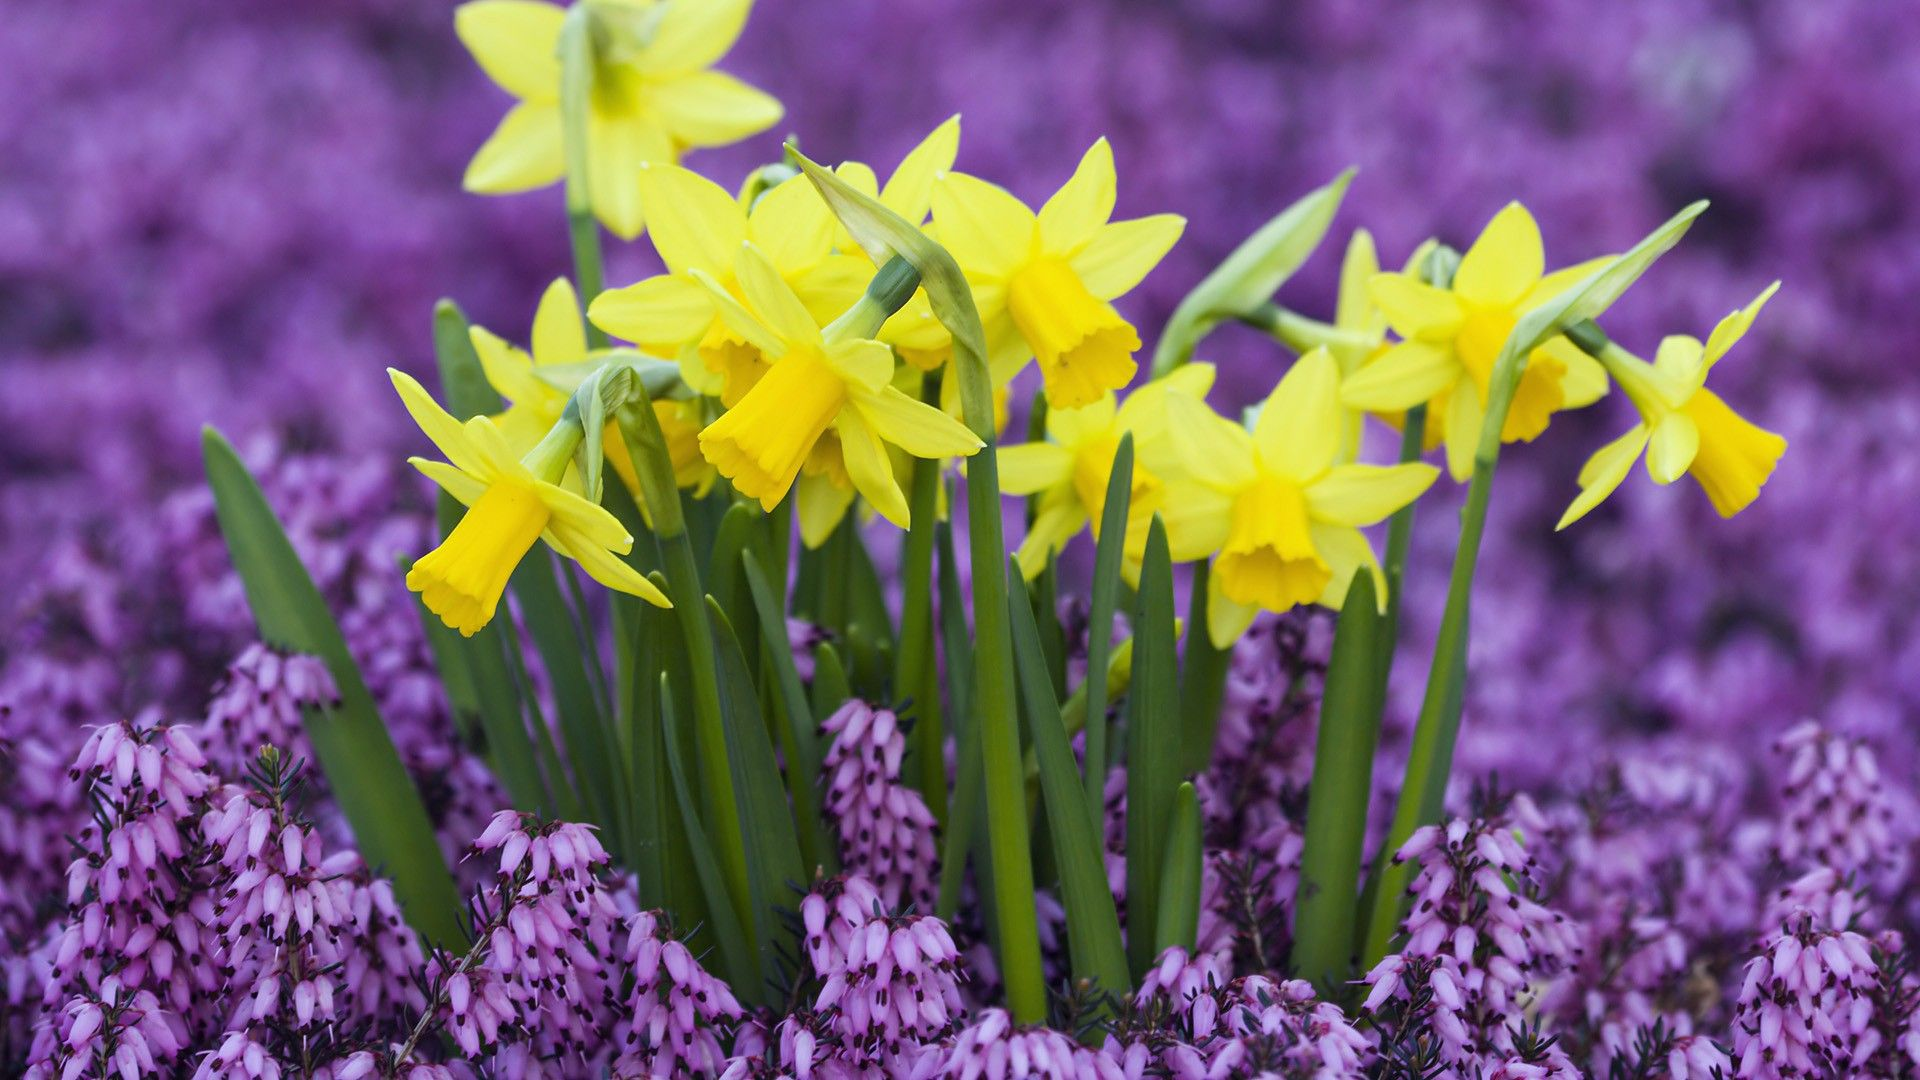 daffodils - wallpaper #32176 | plants | pinterest | daffodils, yard